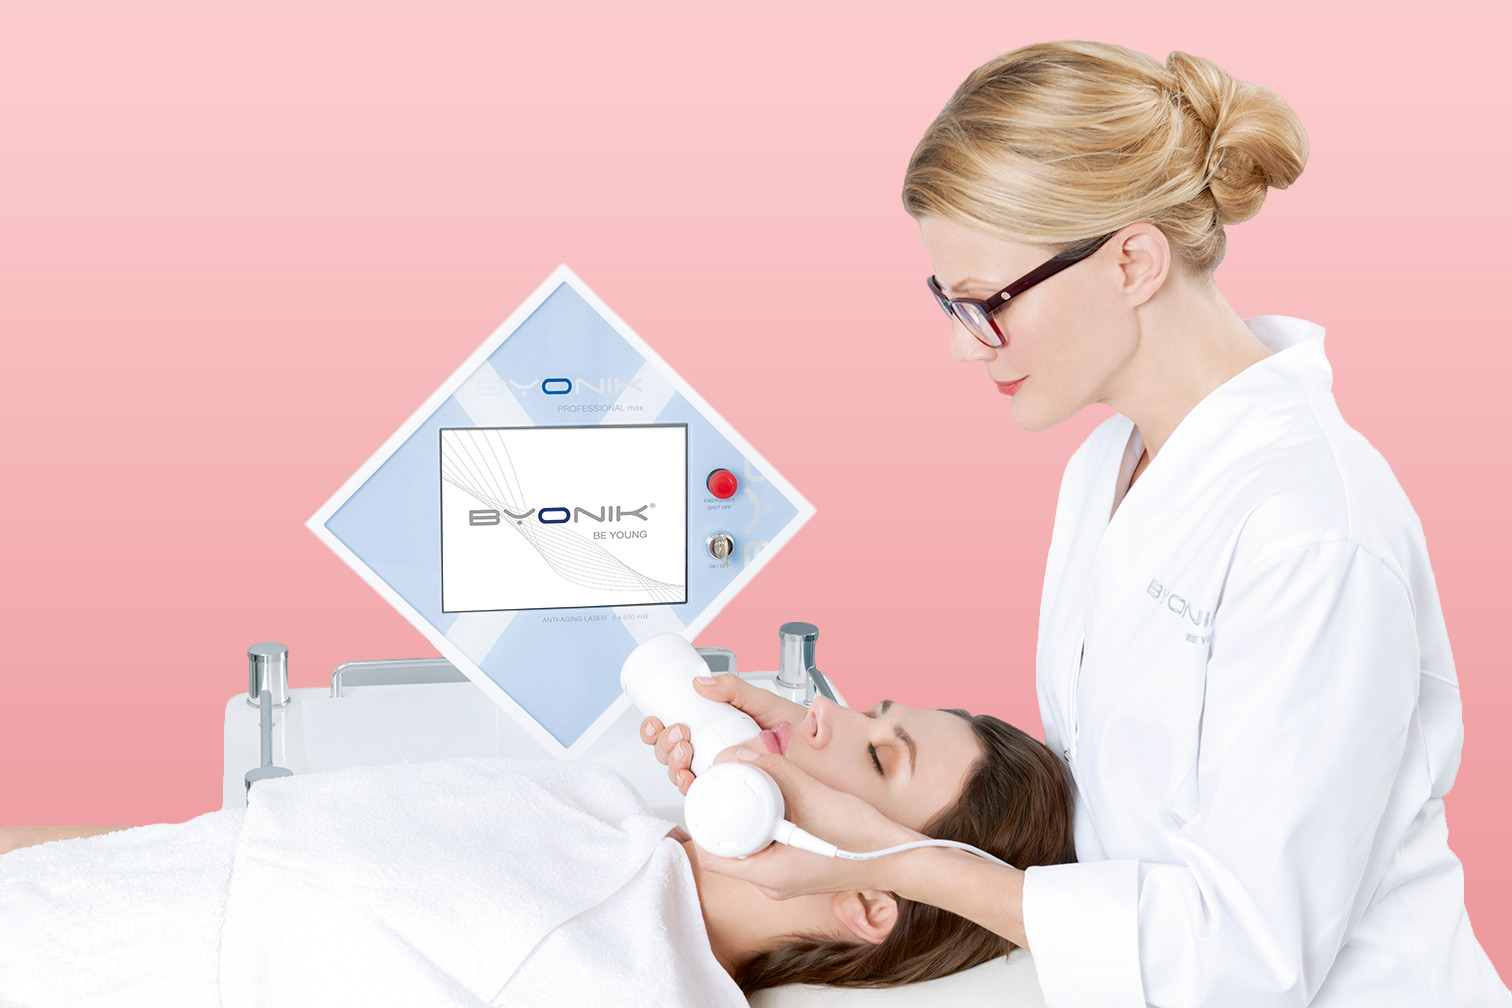 Hautverjüngung mitByonik® - kaltlaser behandlung